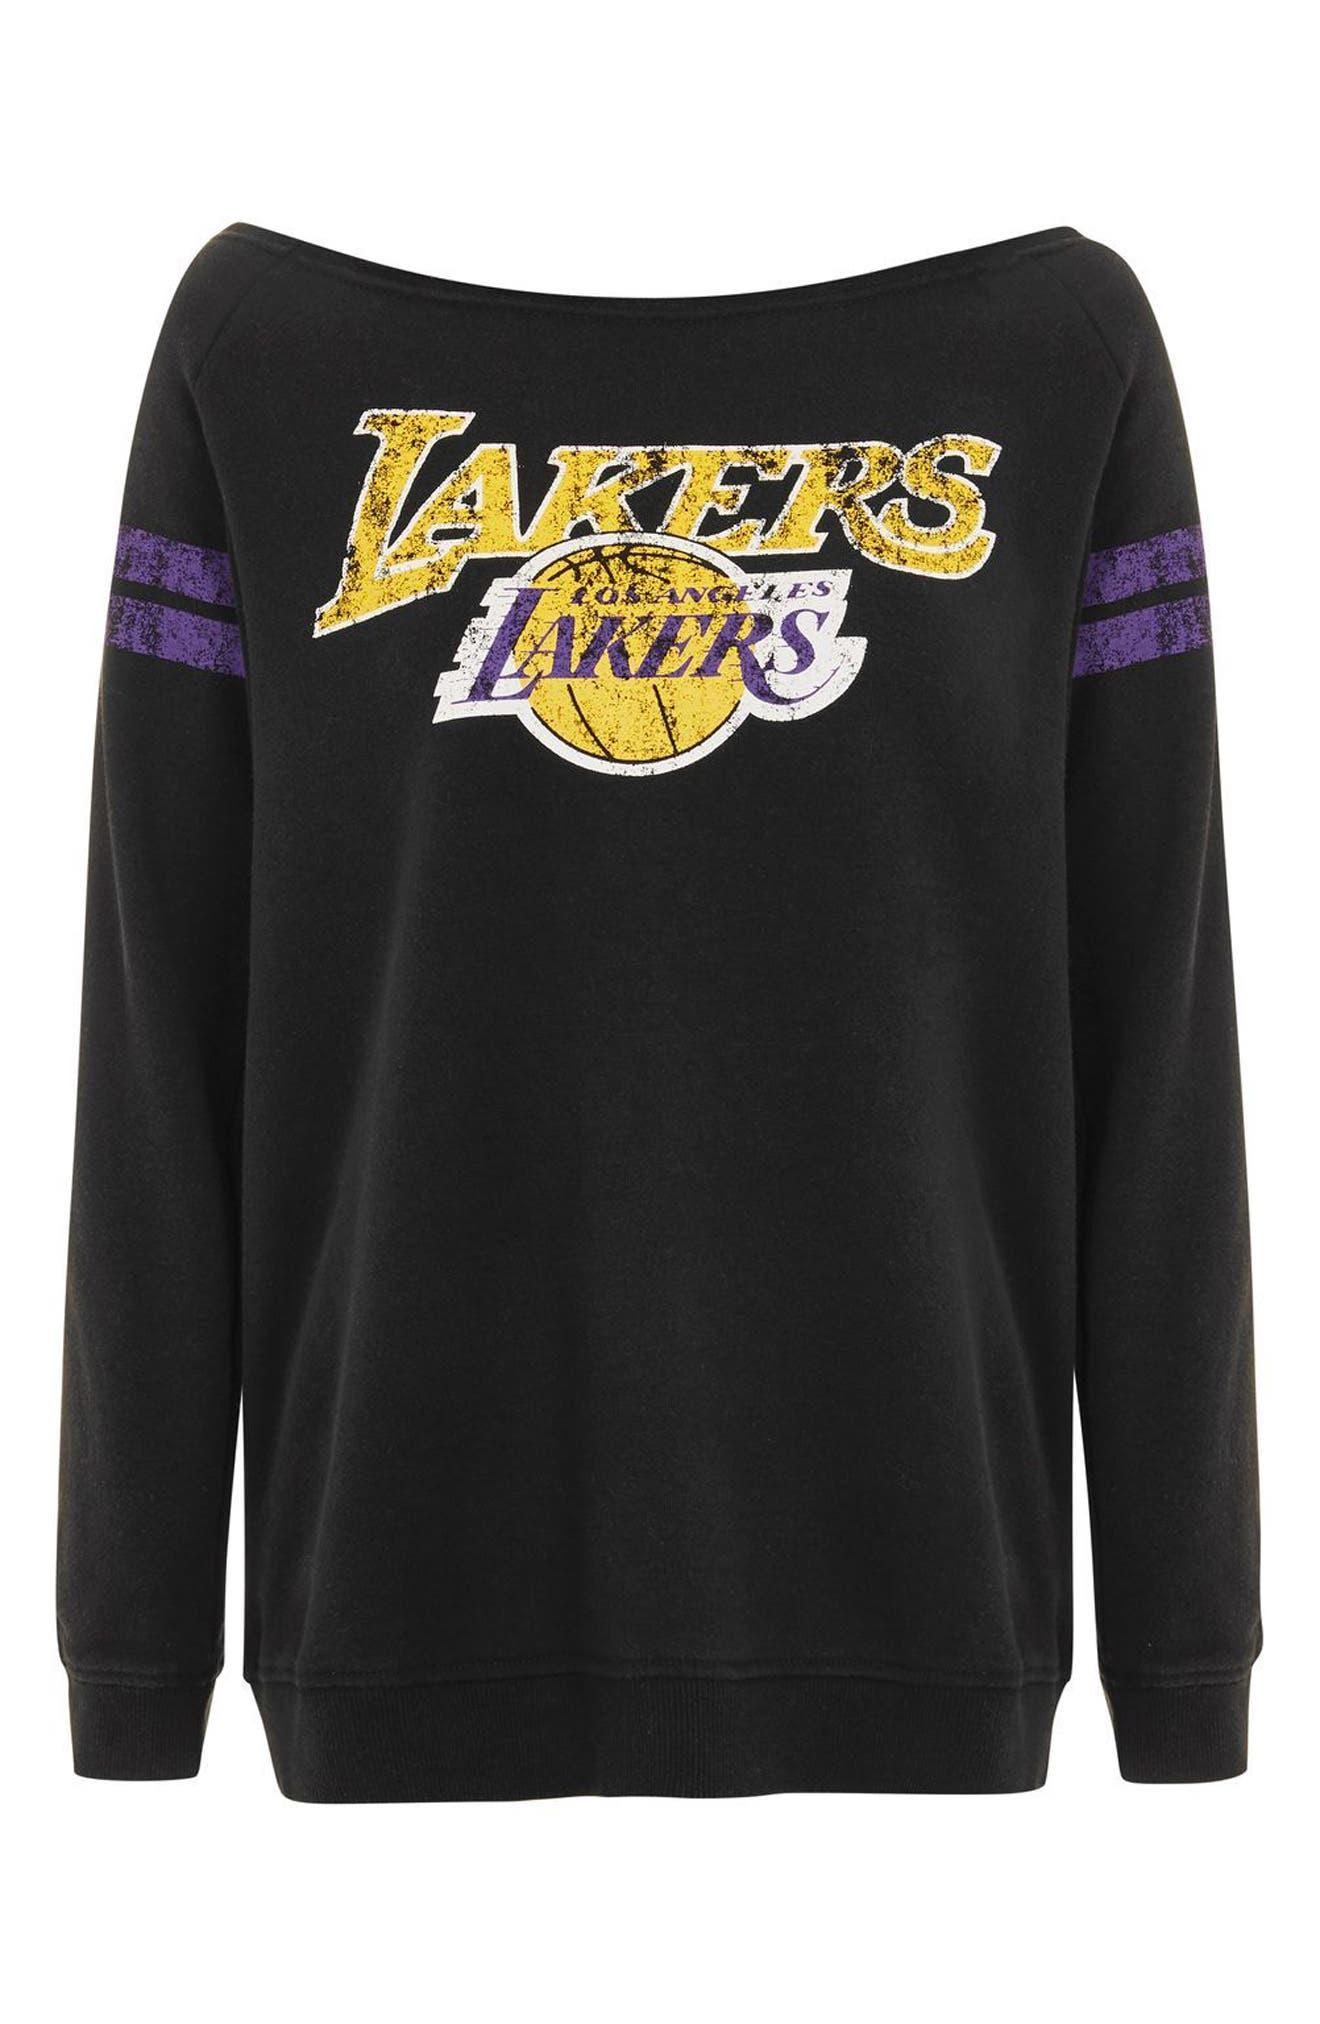 x UNK Lakers Convertible Sweatshirt,                             Alternate thumbnail 4, color,                             Black Multi